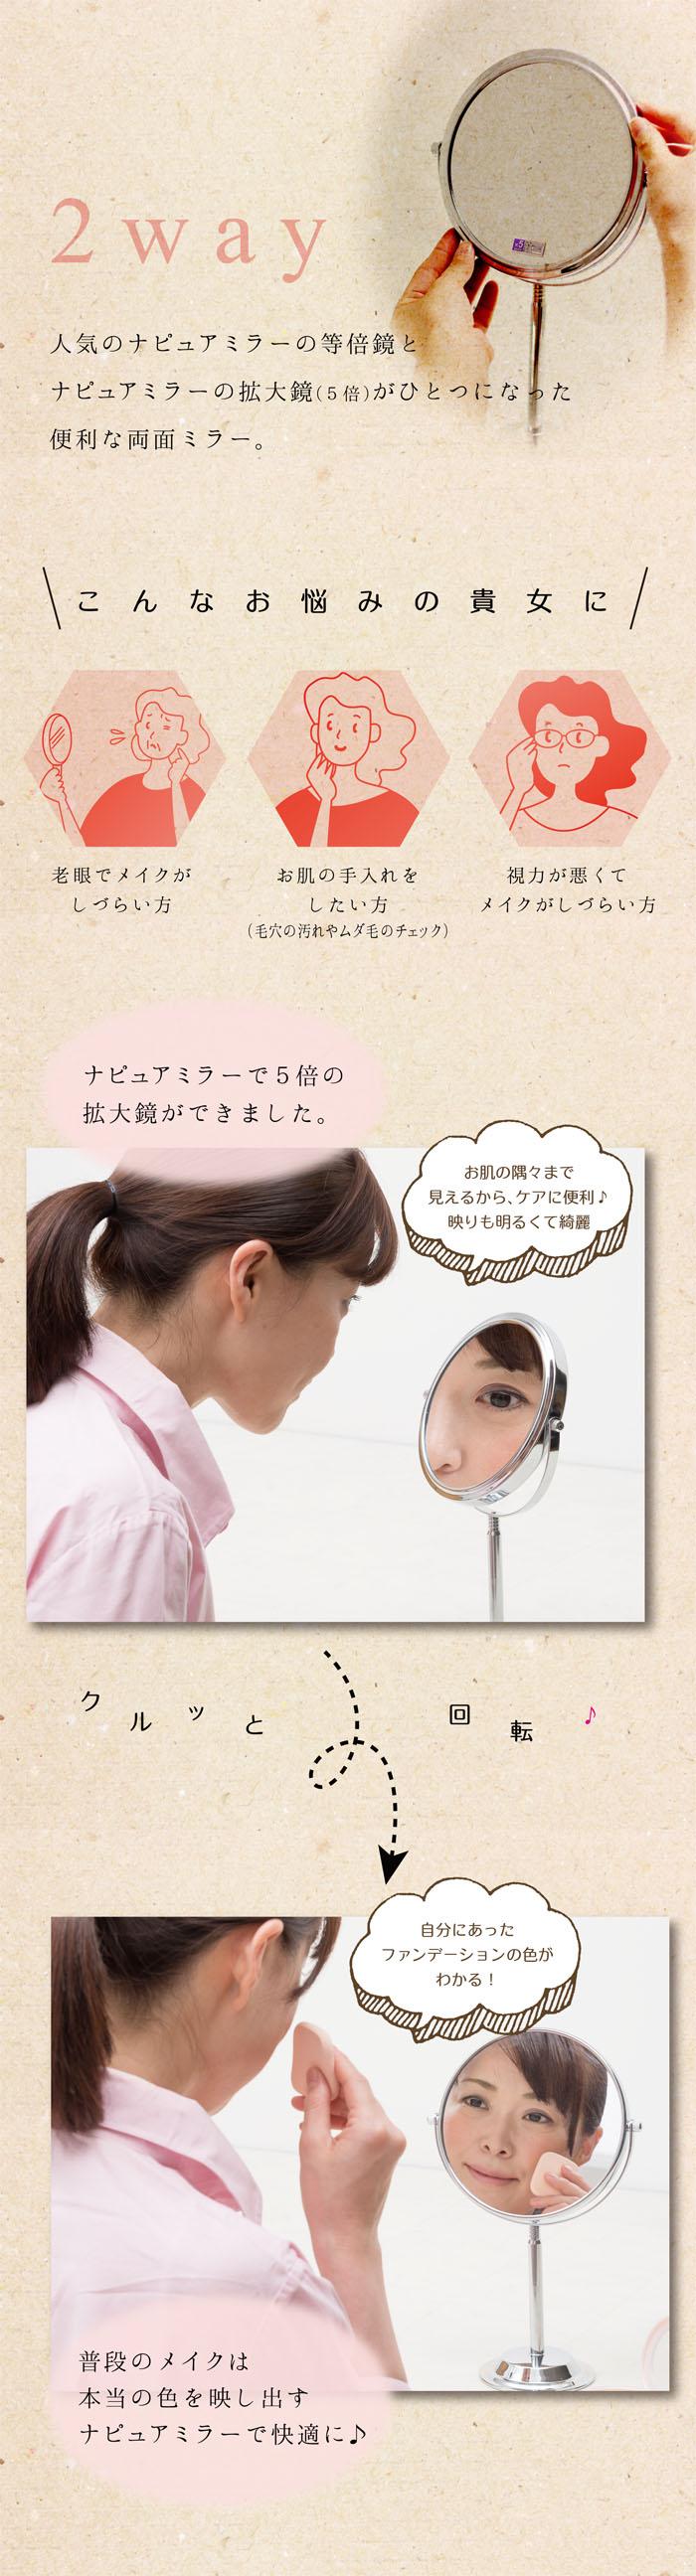 2WAY。人気のナピュアミラーの等倍鏡とナピュアミラーの拡大鏡がひとつになった便利な両面ミラー。